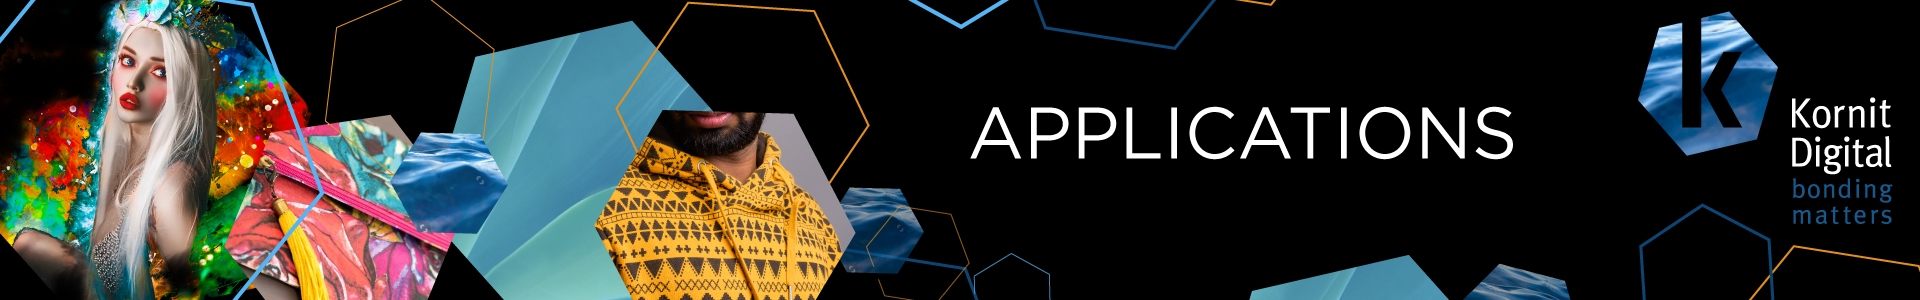 Kornit Applications Banner